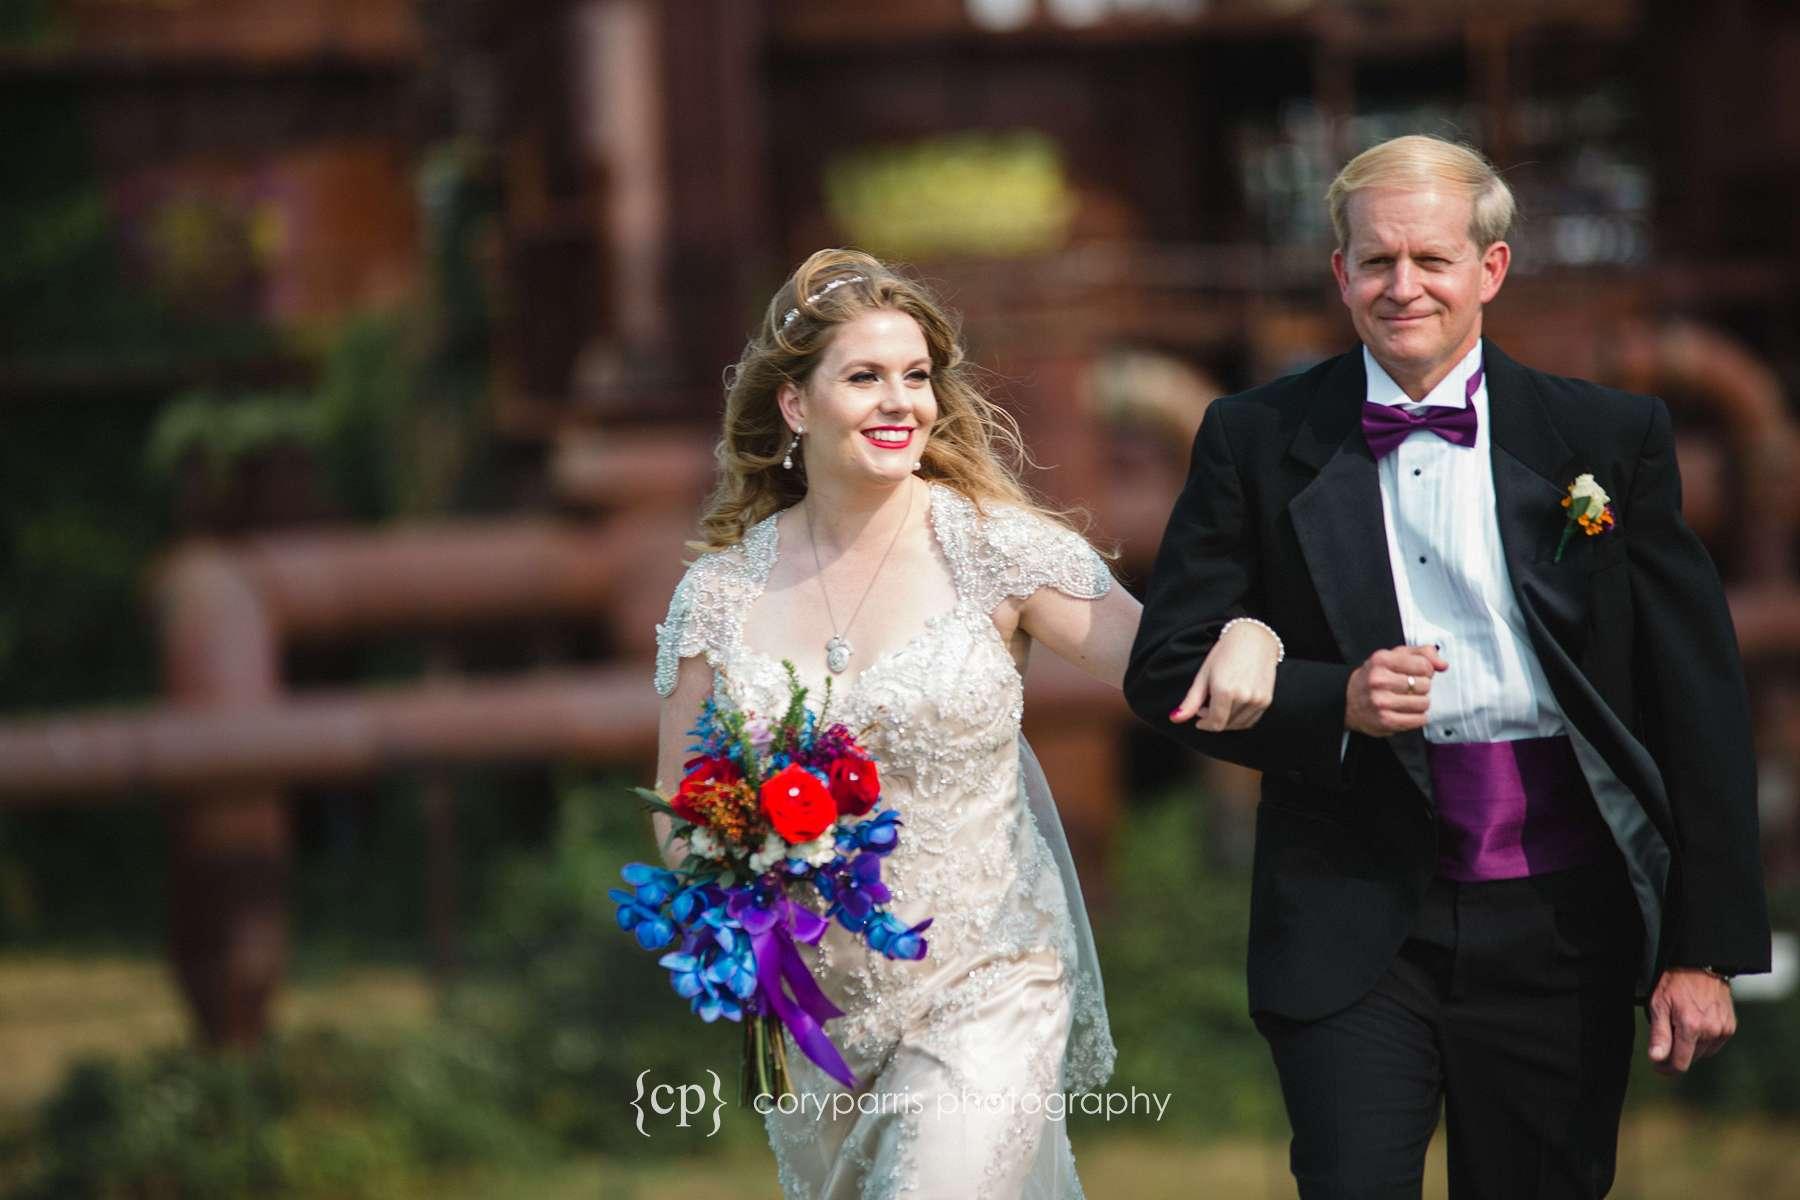 304-gas-works-park-seattle-wedding.jpg